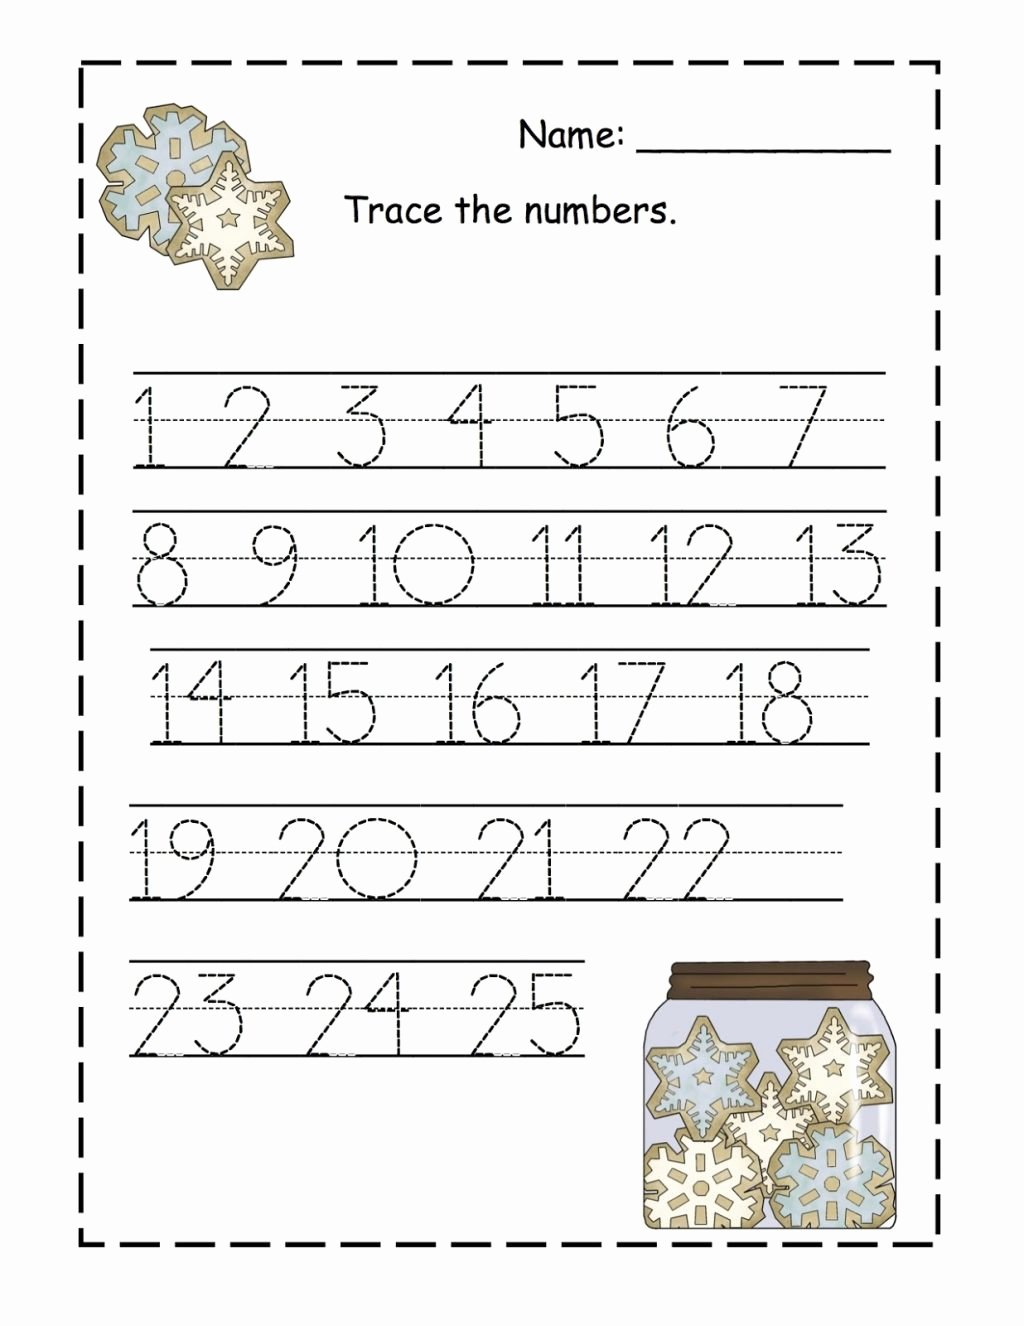 Strokes Worksheets for Preschoolers Fresh Worksheet Worksheet Preschool Printing Worksheets Fabulous